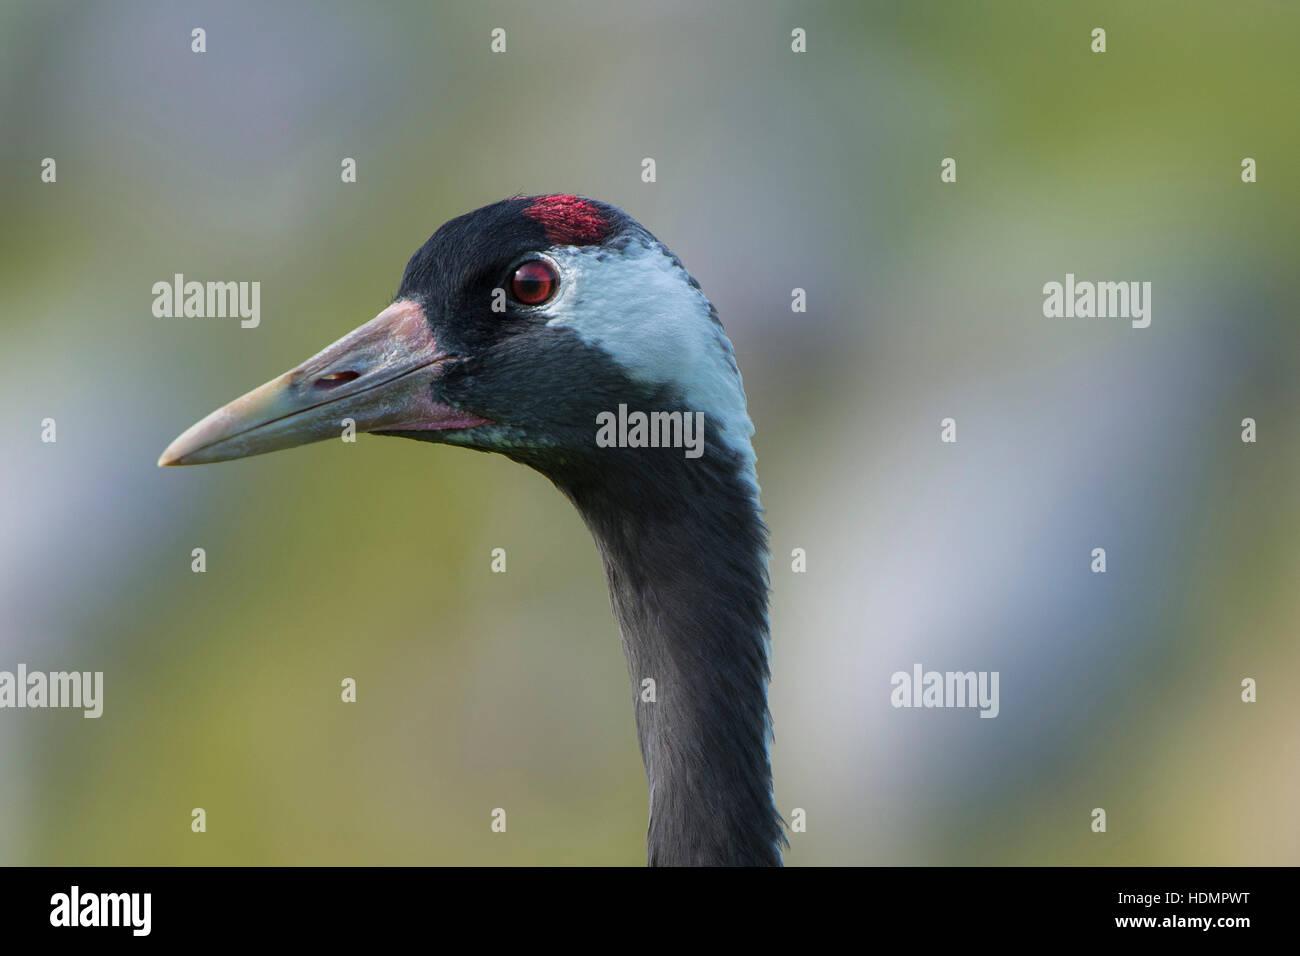 Common or European crane (Grus grus), portrait, migratory stopover site, Günzer See, Groß Mohrdorf - Stock Image